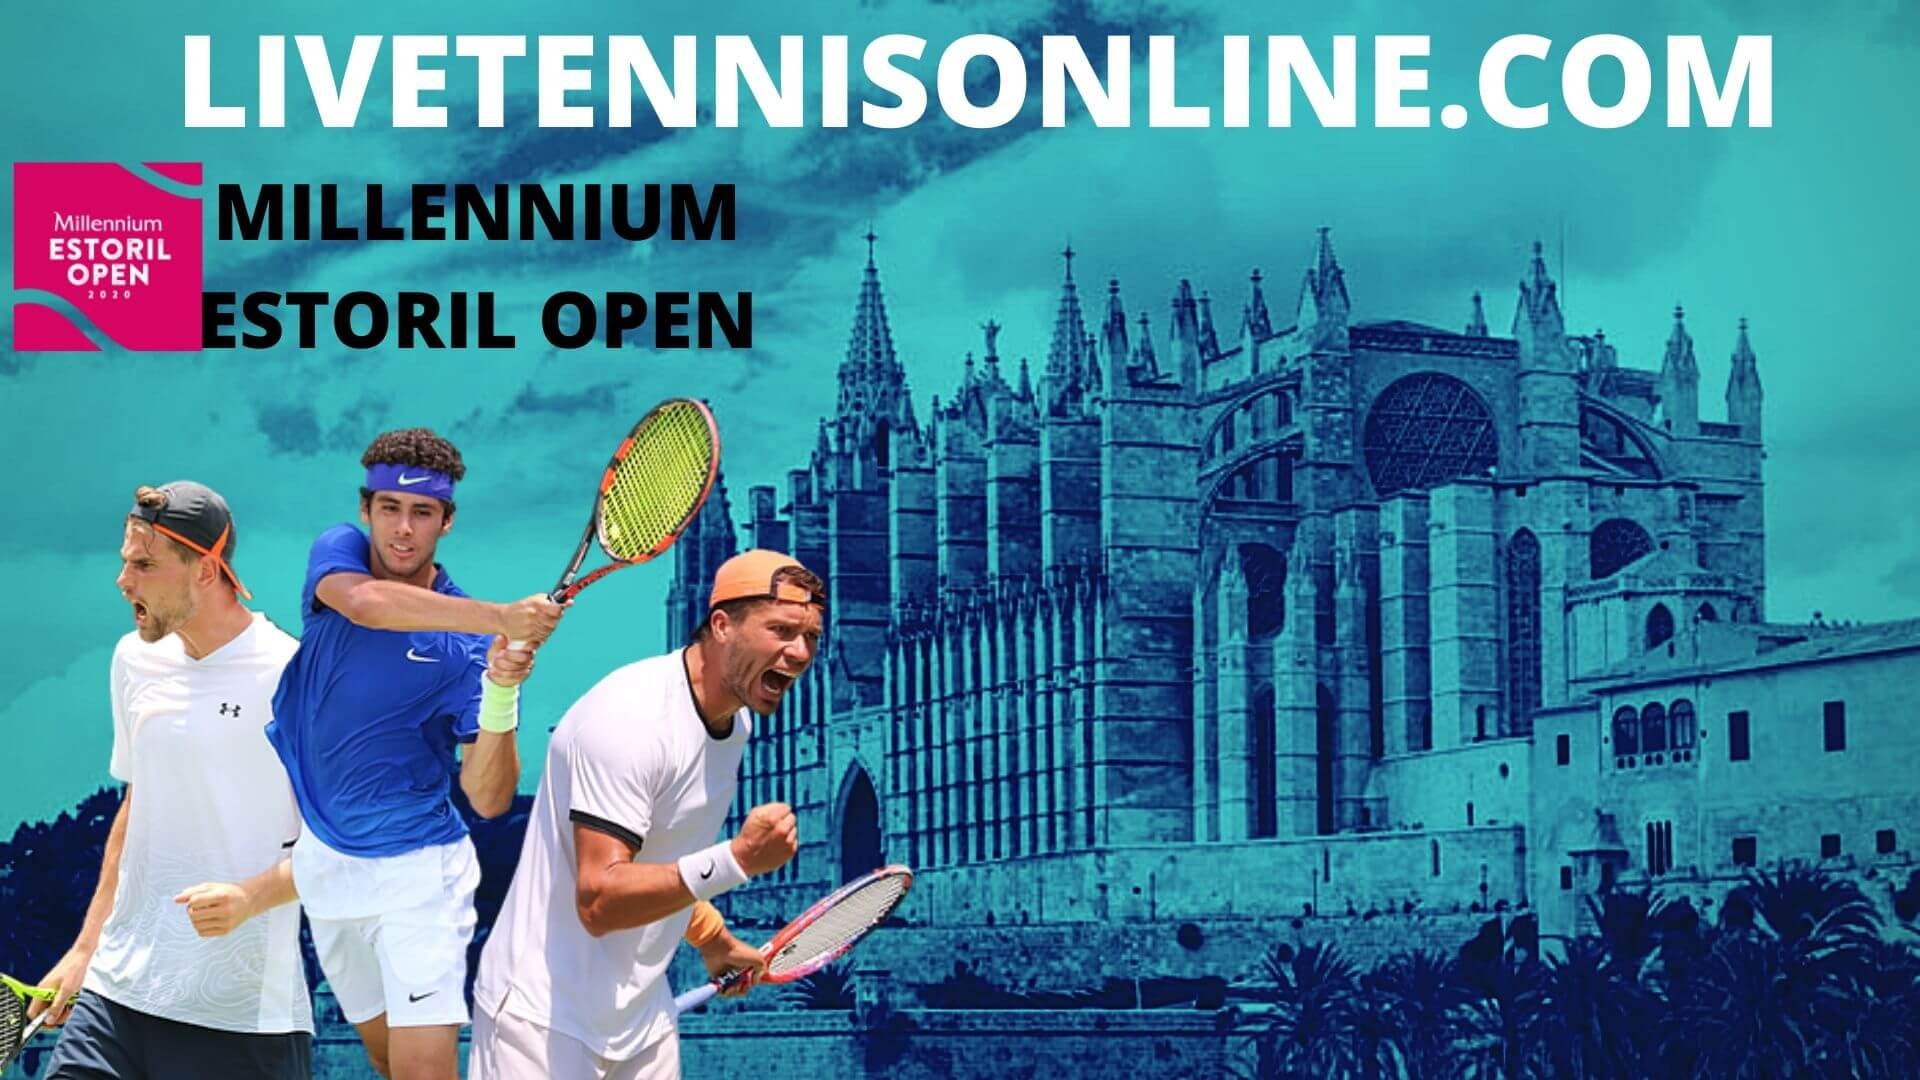 Millennium Estoril Open Live Stream 2020 | ATP Final